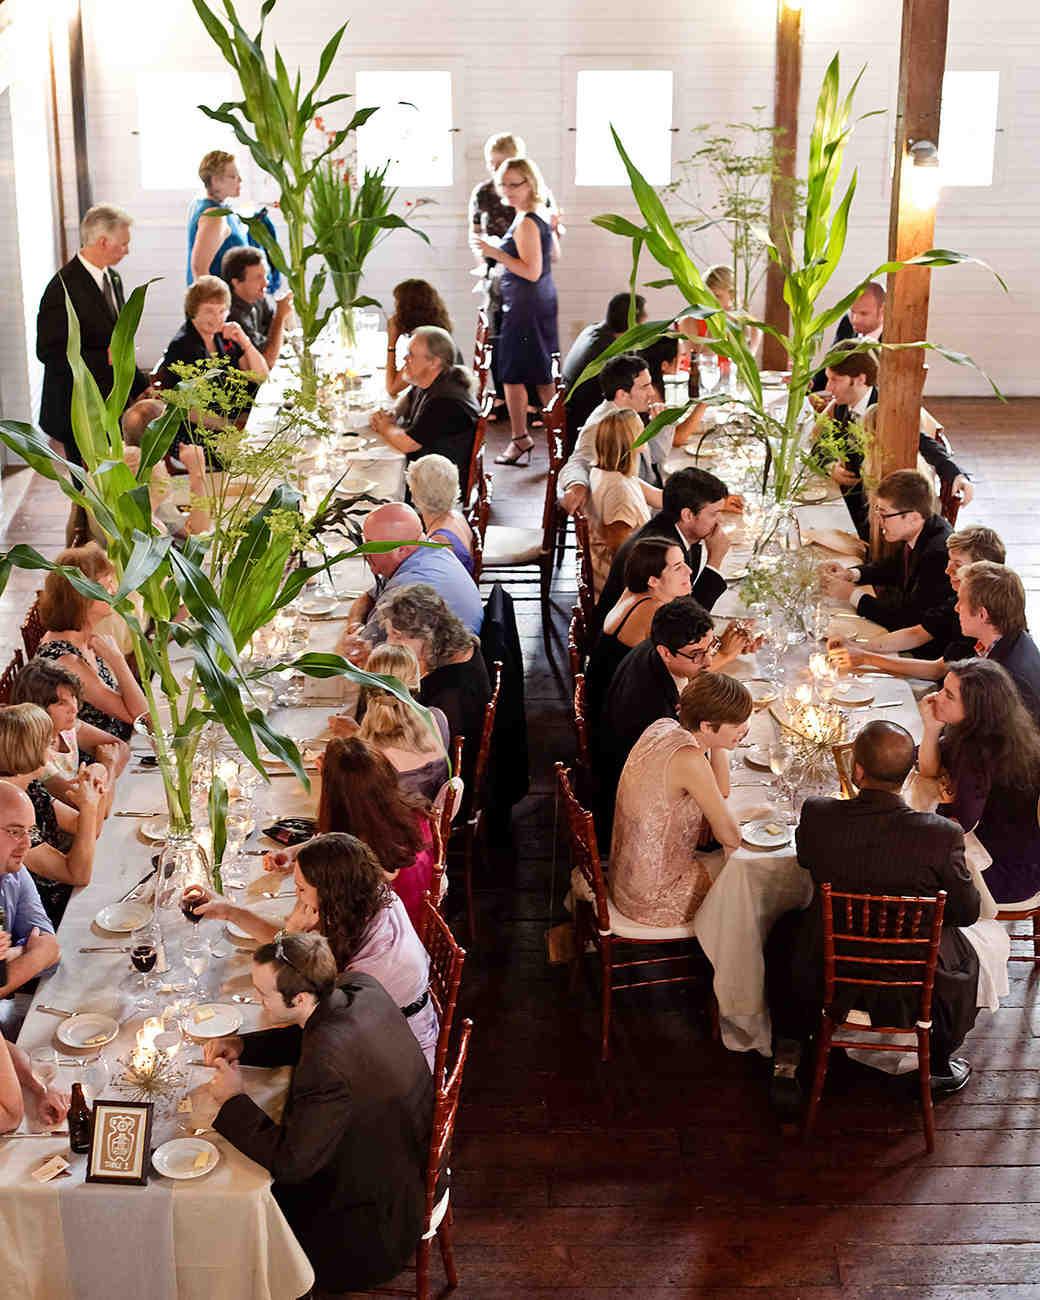 dinner-0811wd106246.jpg